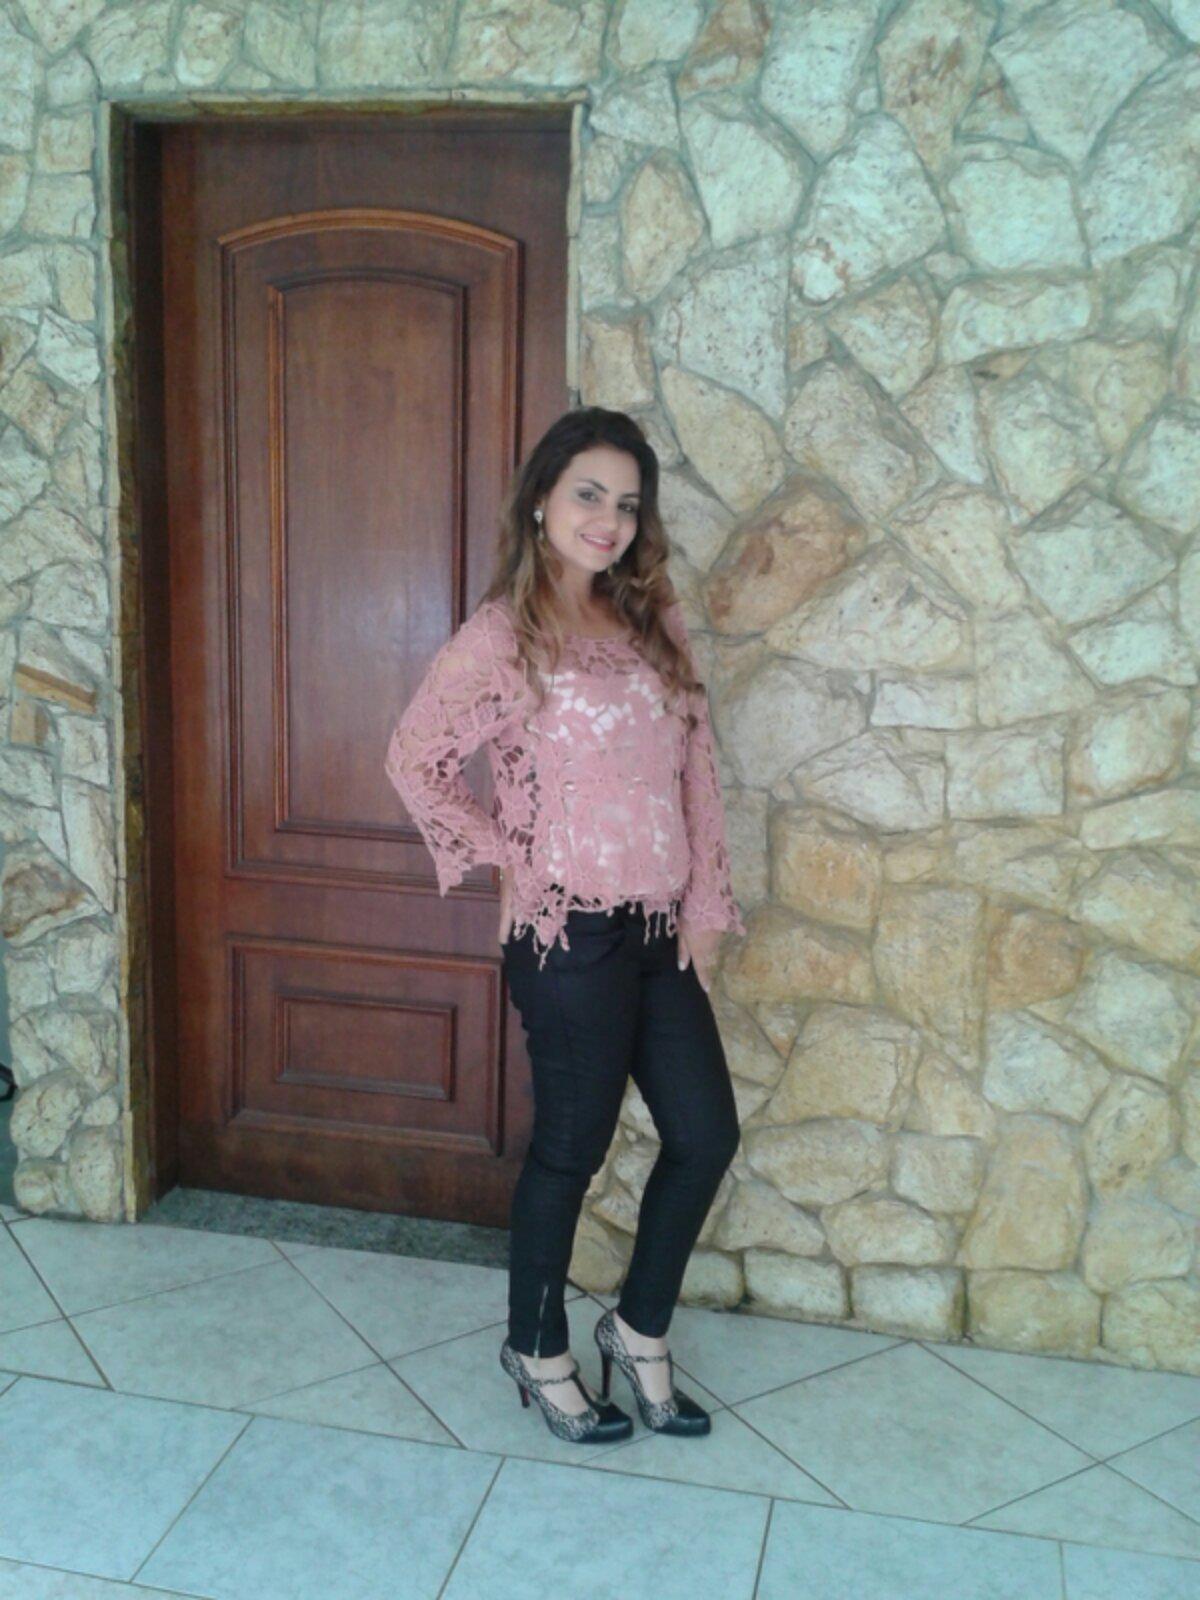 wpid-20131124_150226 Look de domingo blusa de renda + calca resignada